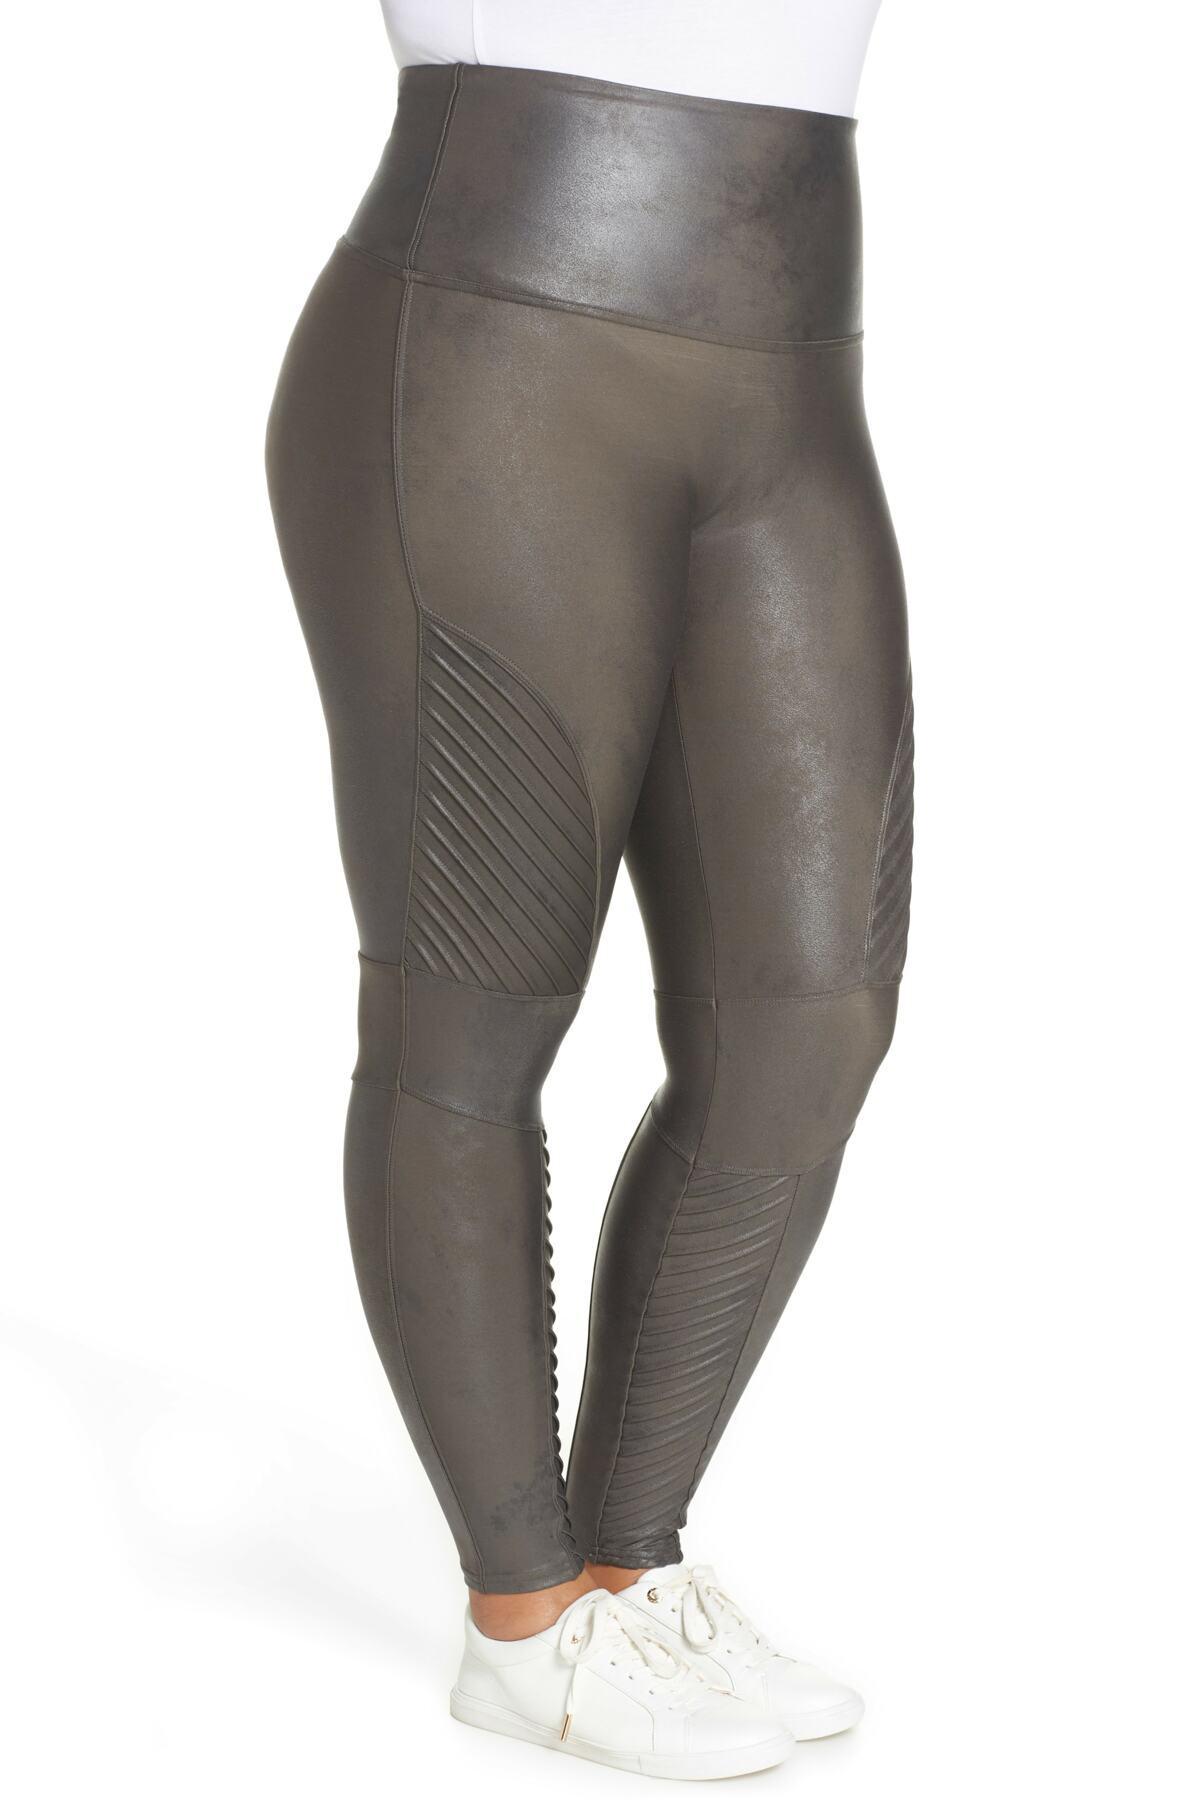 11a23c12bb3465 Spanx High Waist Moto Leggings (plus Size) in Gray - Lyst